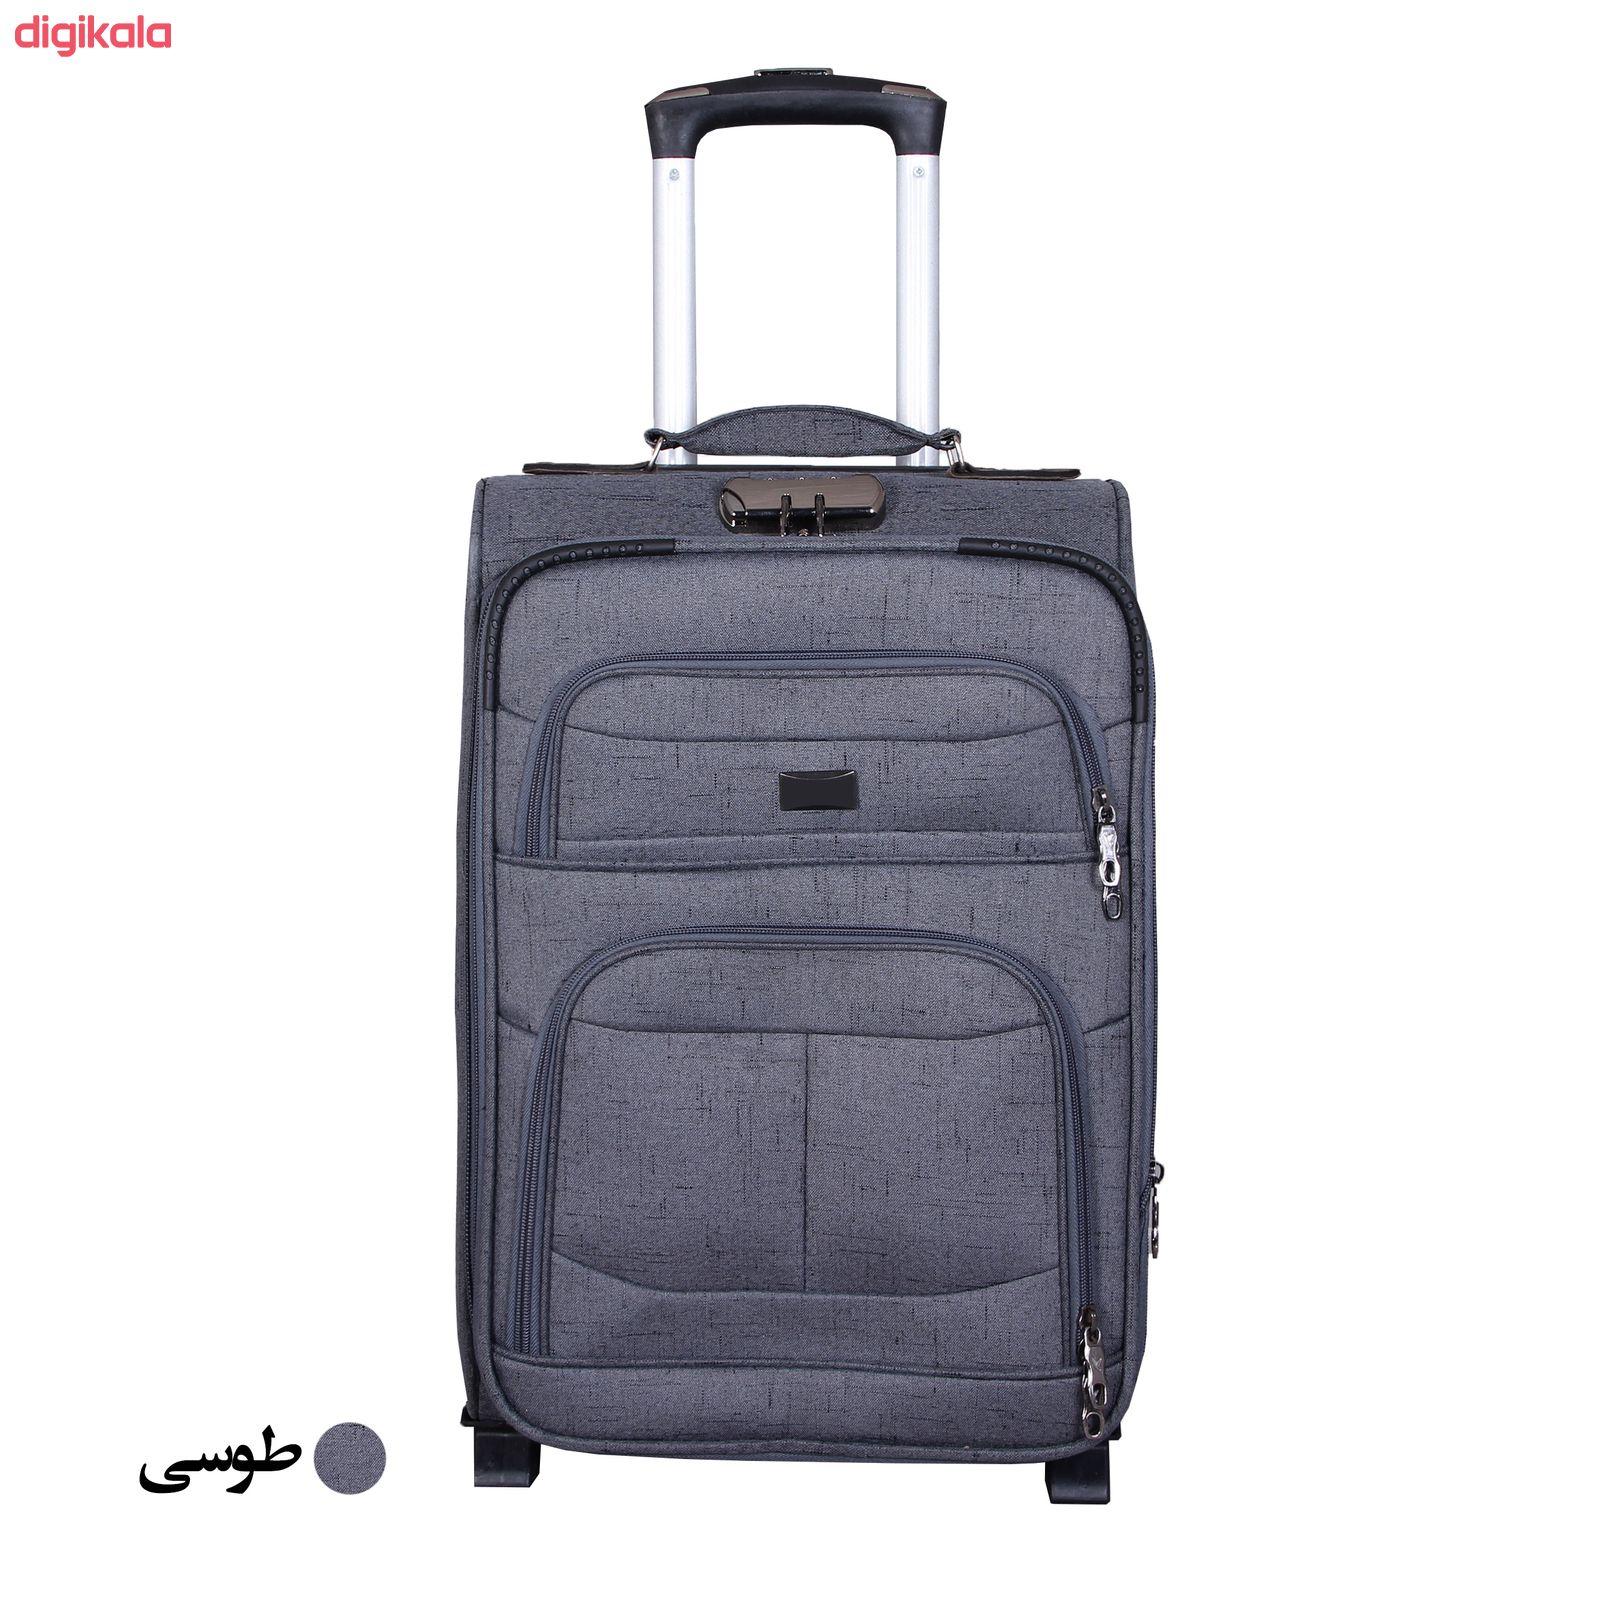 مجموعه سه عددی چمدان کد 2301A main 1 4